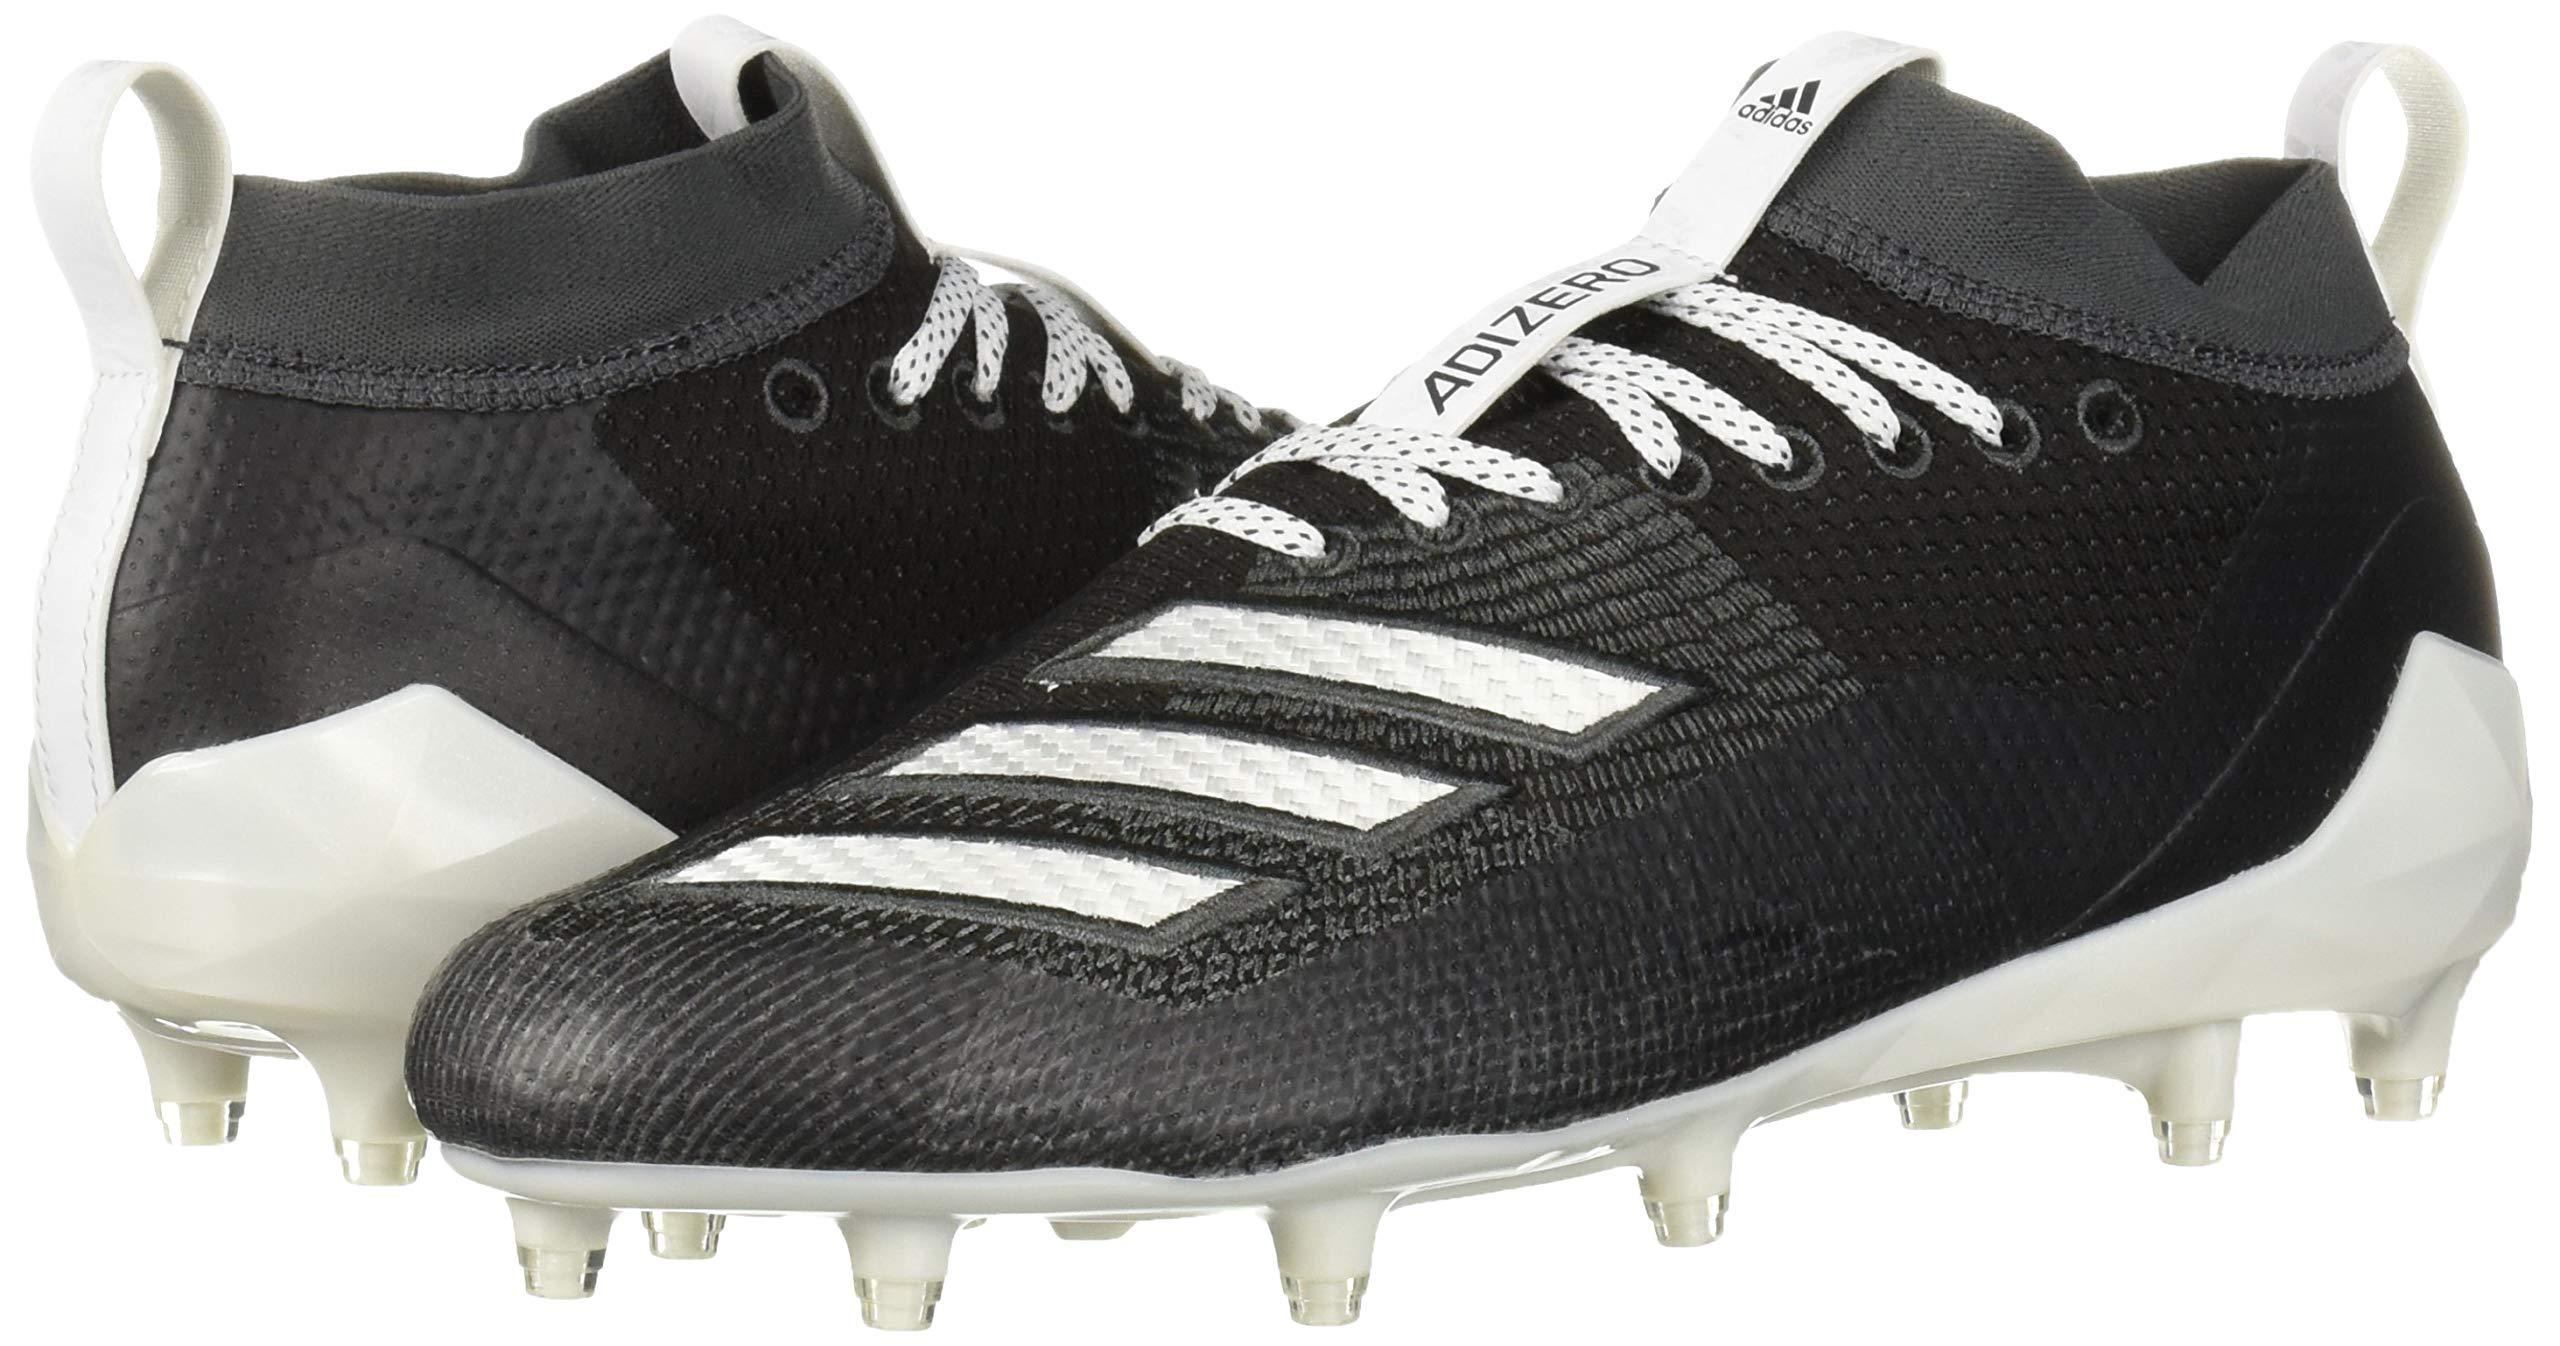 adidas Men's Adizero 8.0 Football Shoe Black/White/Grey 6.5 M US by adidas (Image #6)